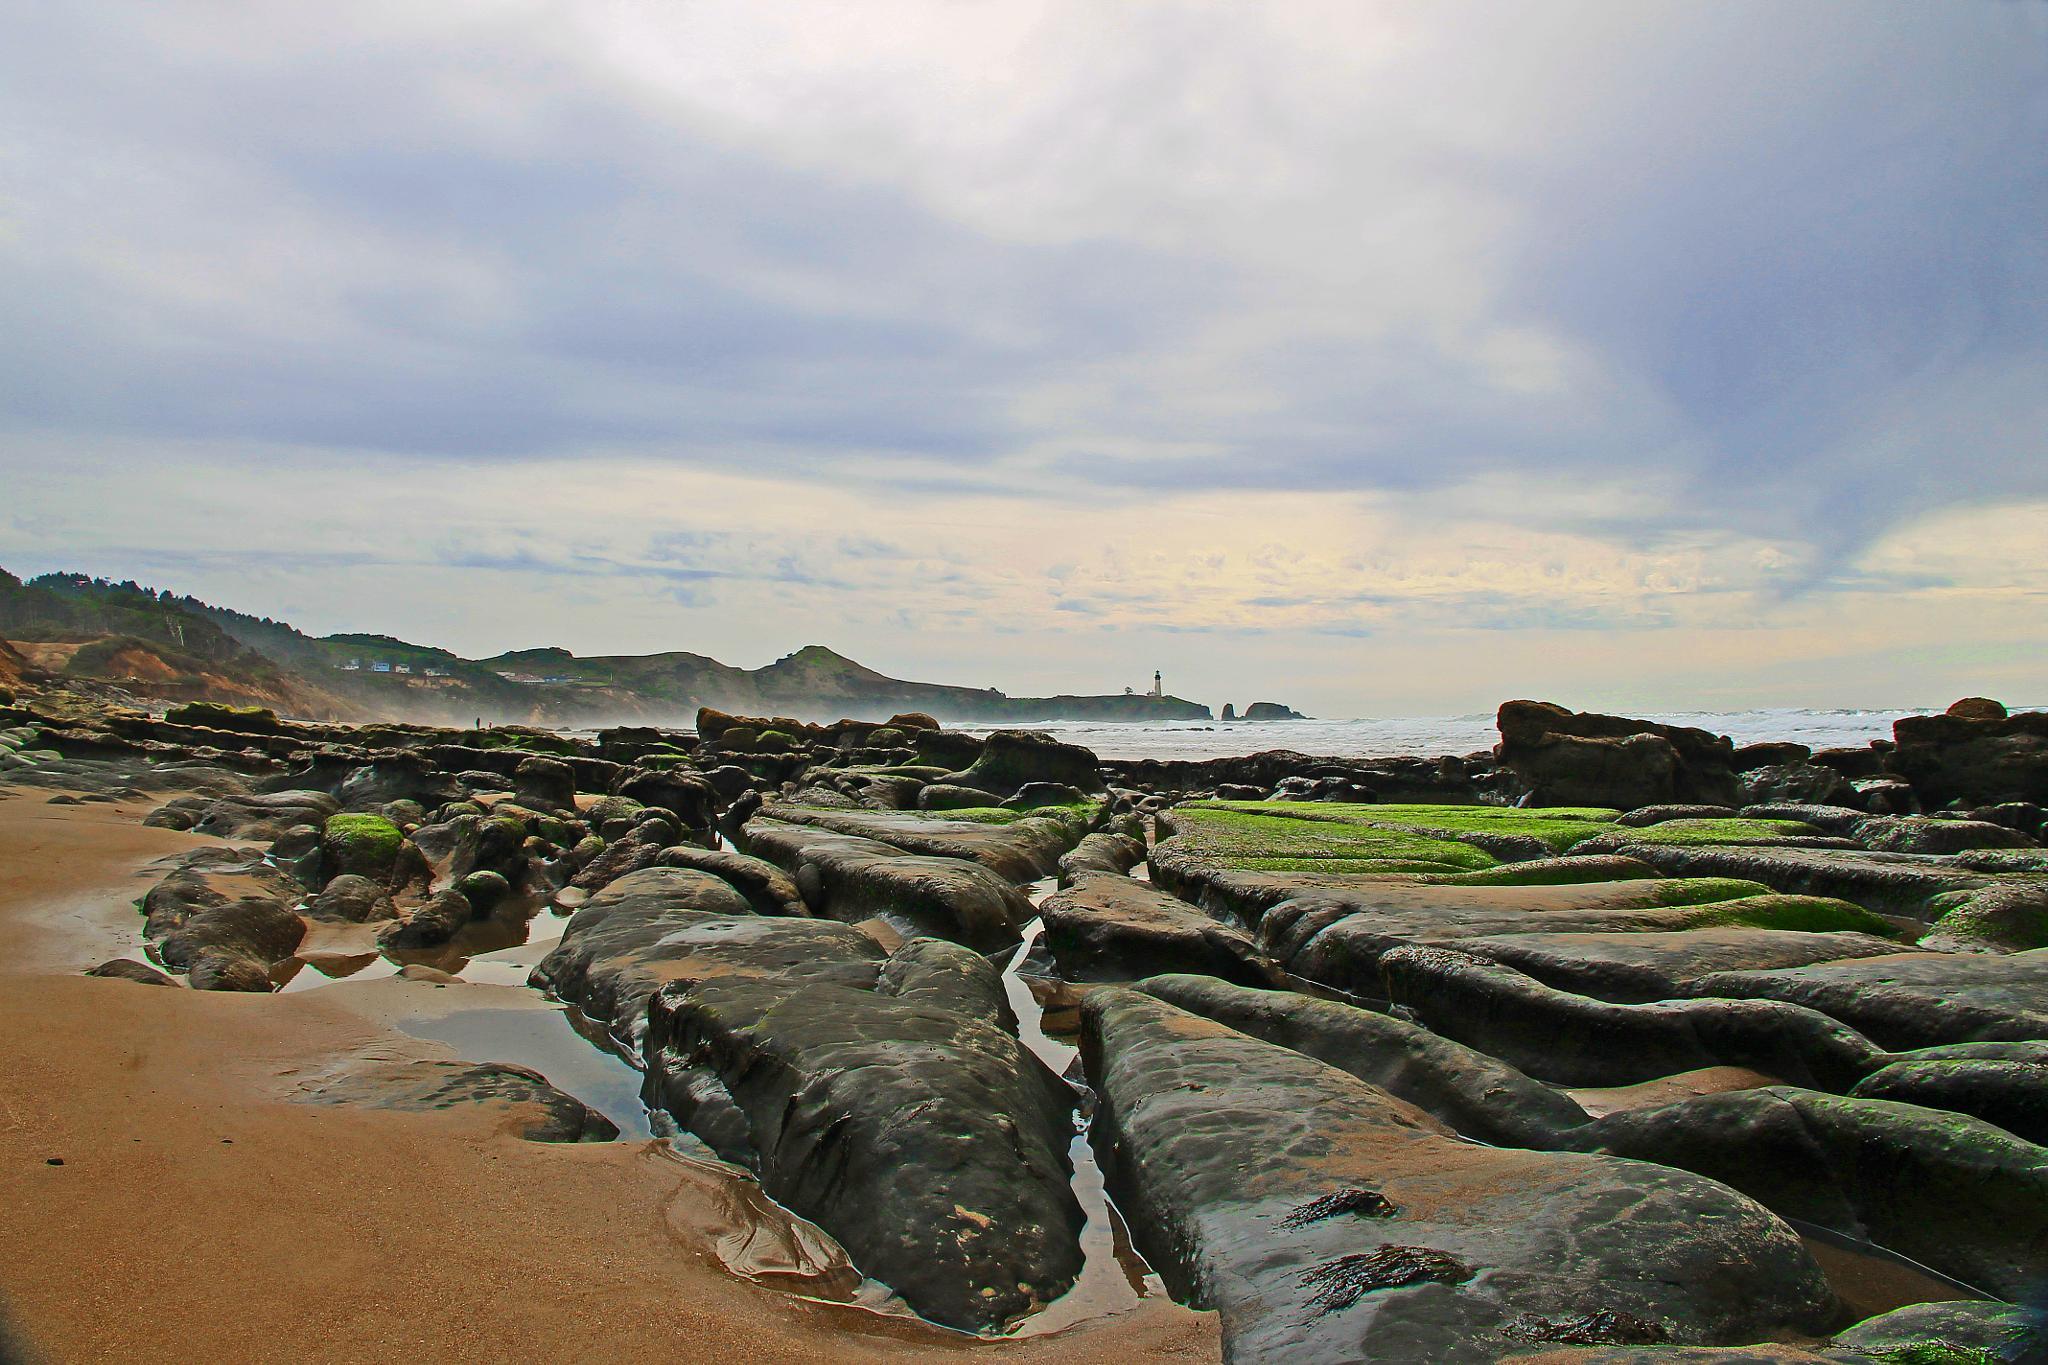 Moolack Beach II by christena.anderson